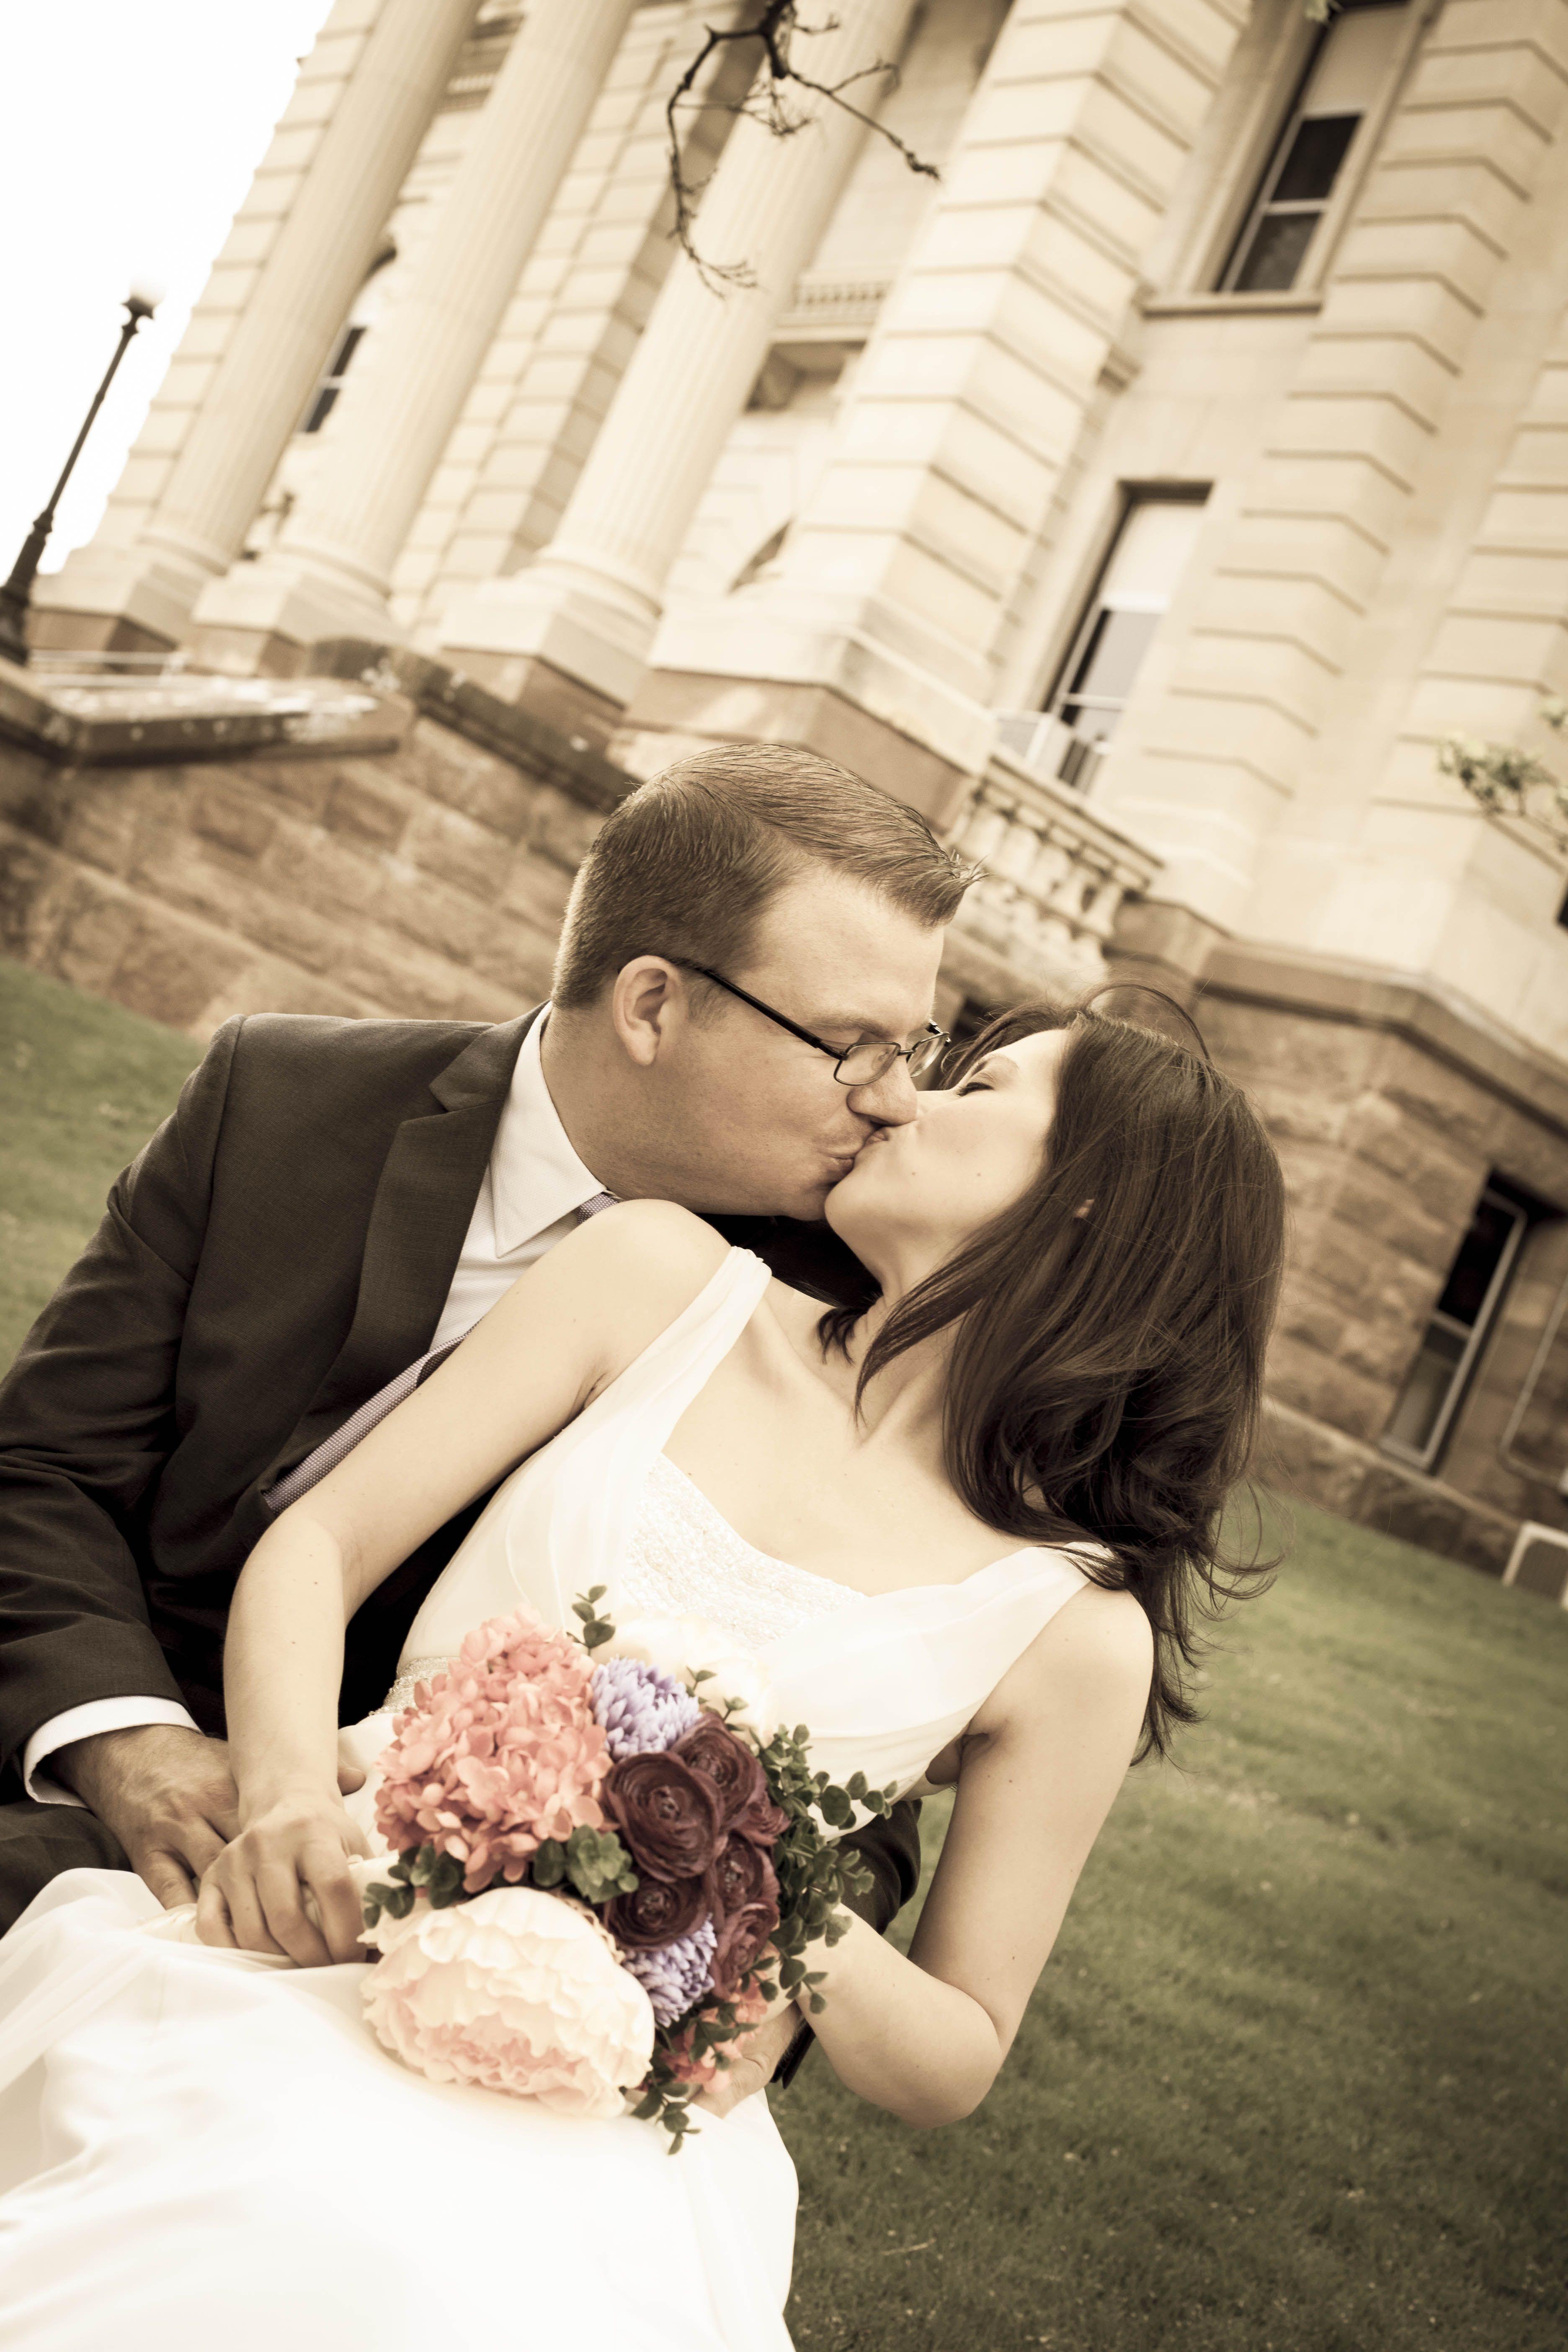 Decorah Iowa, Courthouse Wedding, Civil Ceremony, Photography by ...